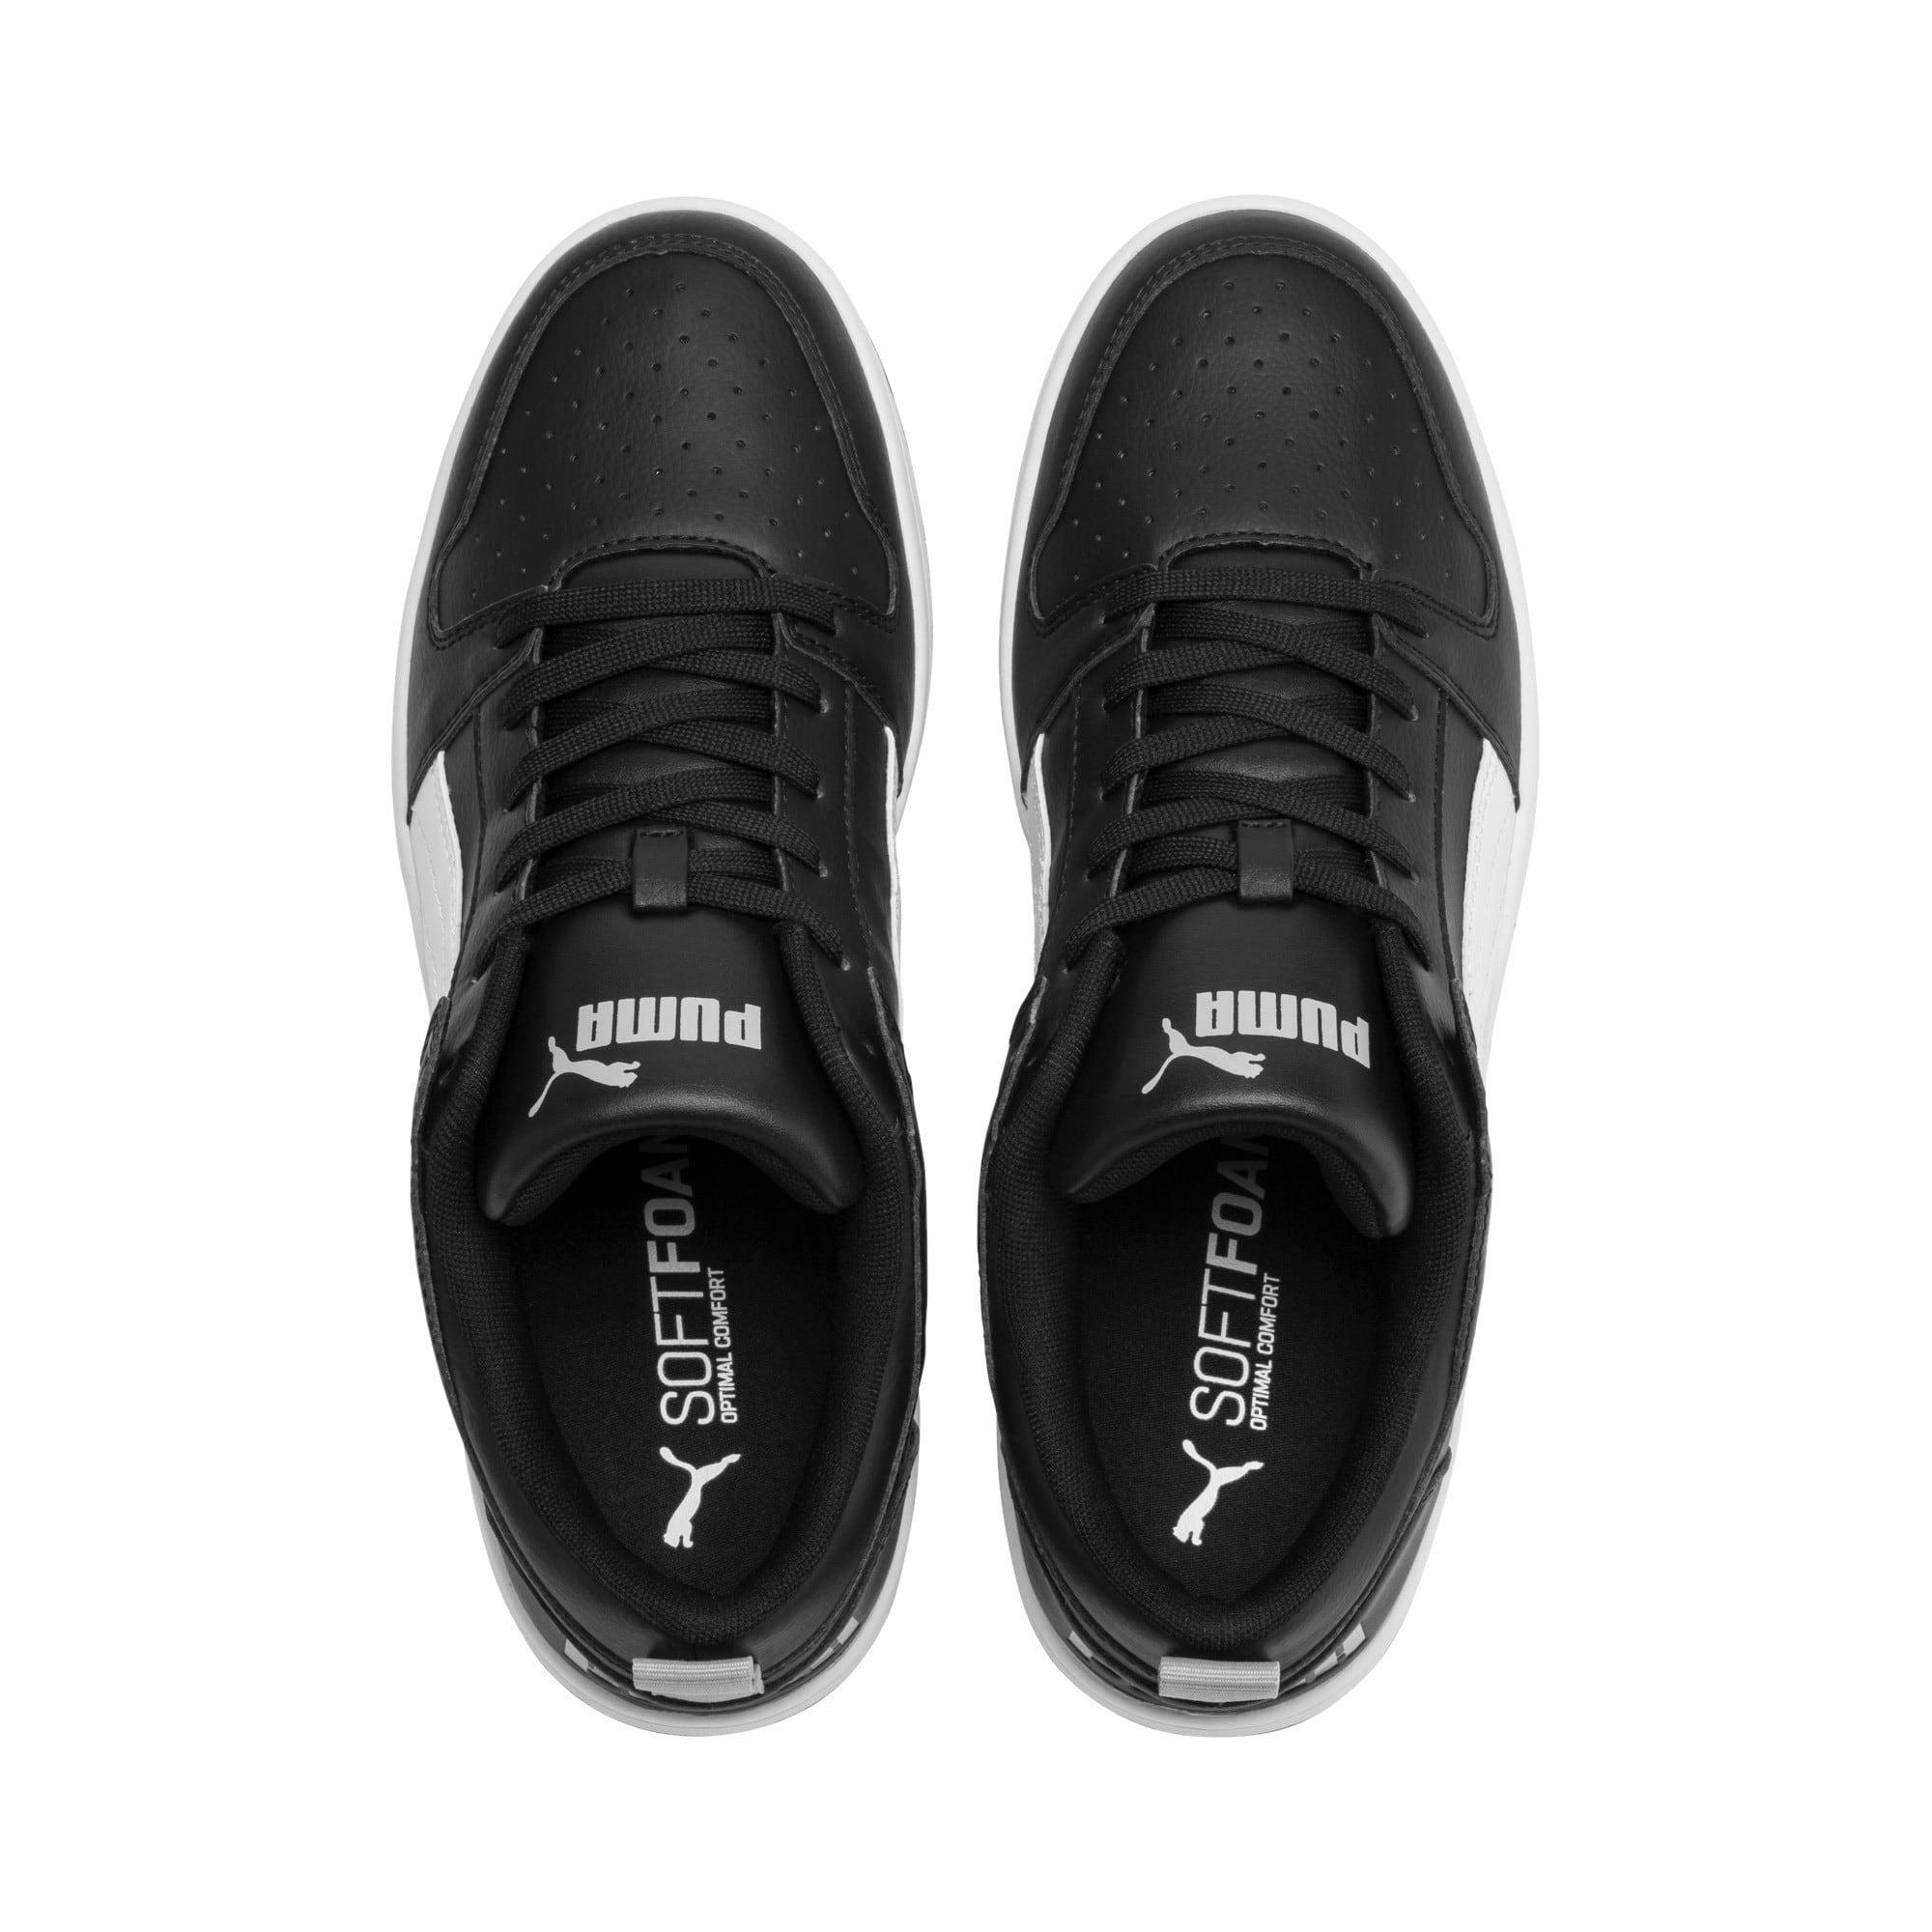 Thumbnail 7 of PUMA Rebound LayUp Lo Sneakers, Puma Black-White-High Rise, medium